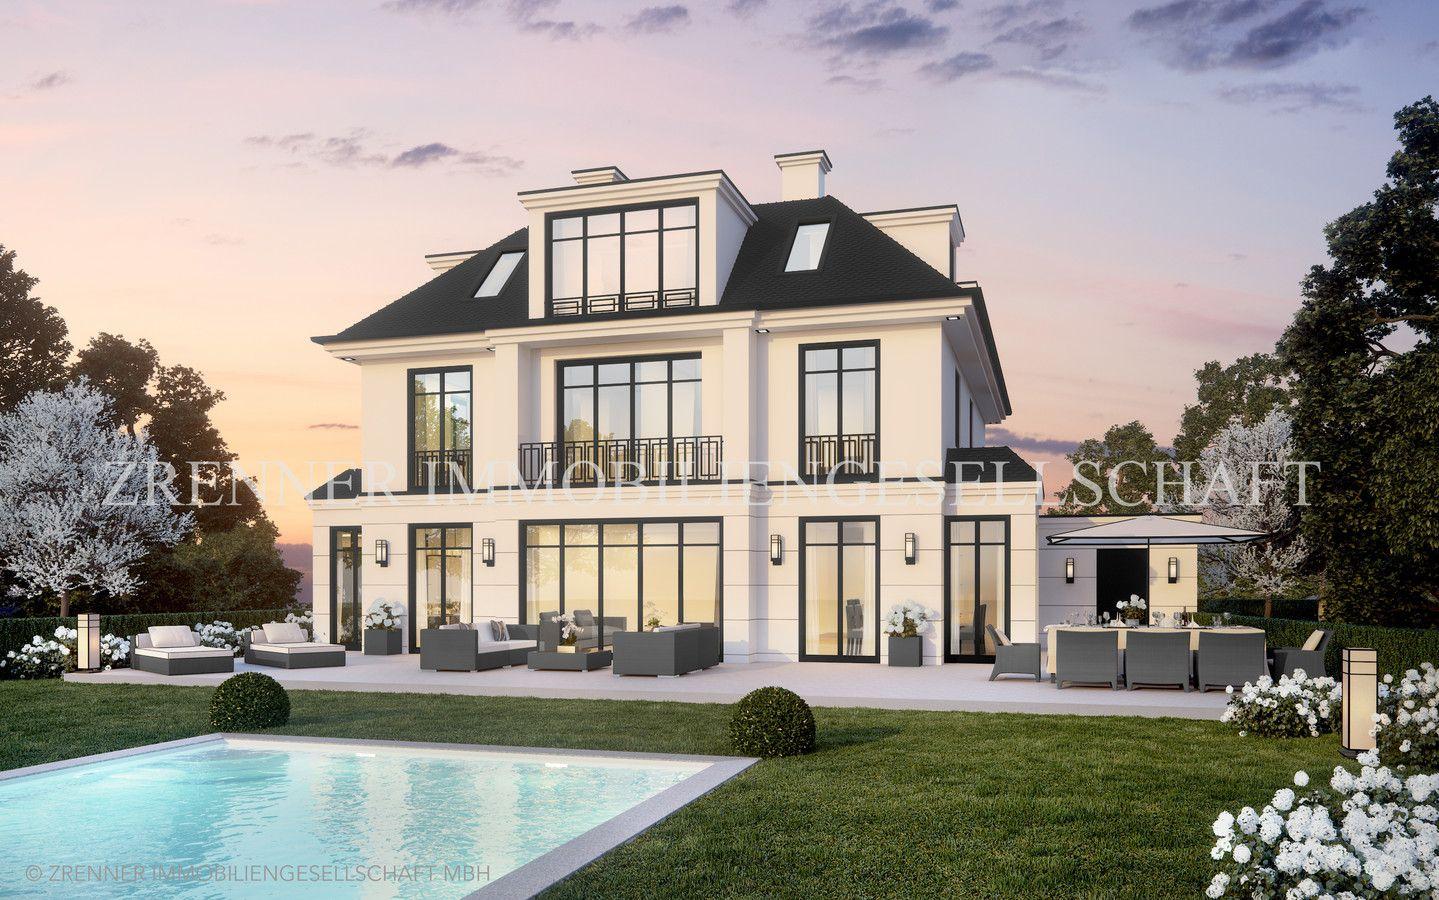 h7 zrenner immobiliengesellschaft mbh h user pinterest haus immobilien und haus architektur. Black Bedroom Furniture Sets. Home Design Ideas